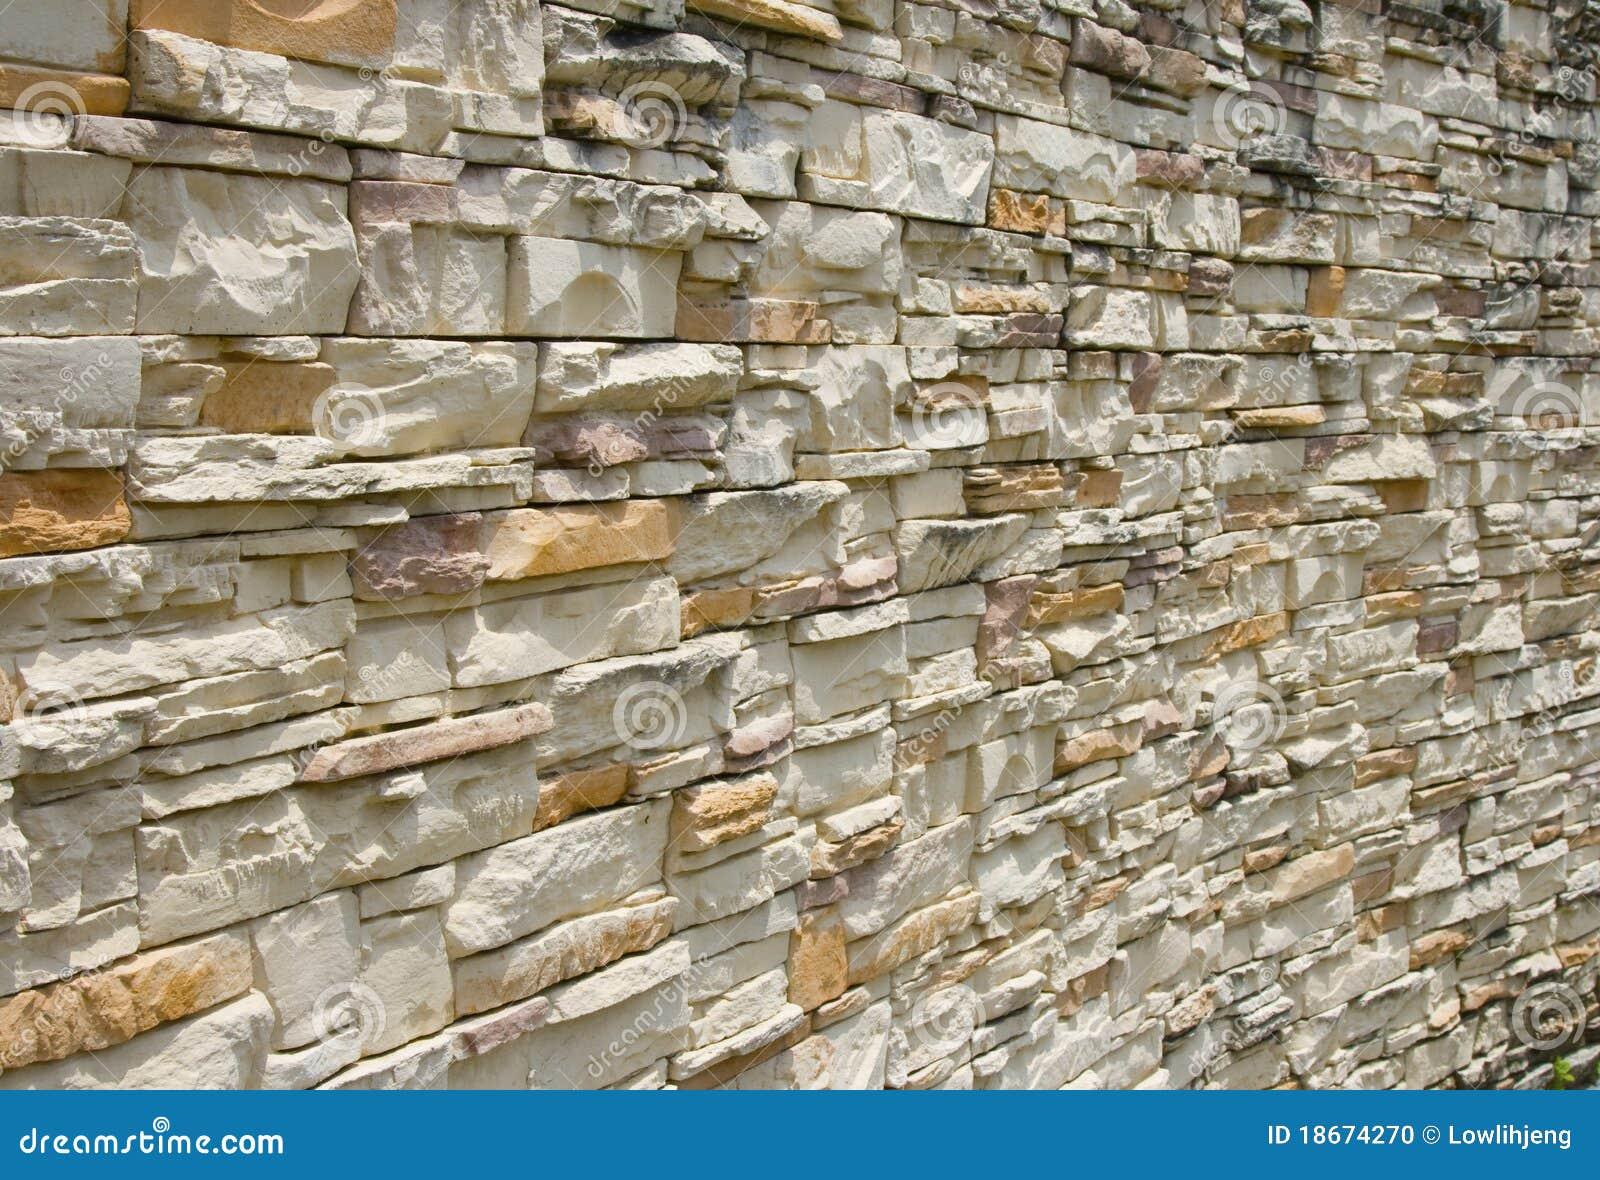 Apartment bathroom themes - Stone Wall Cladding Stock Photo Image 18674270